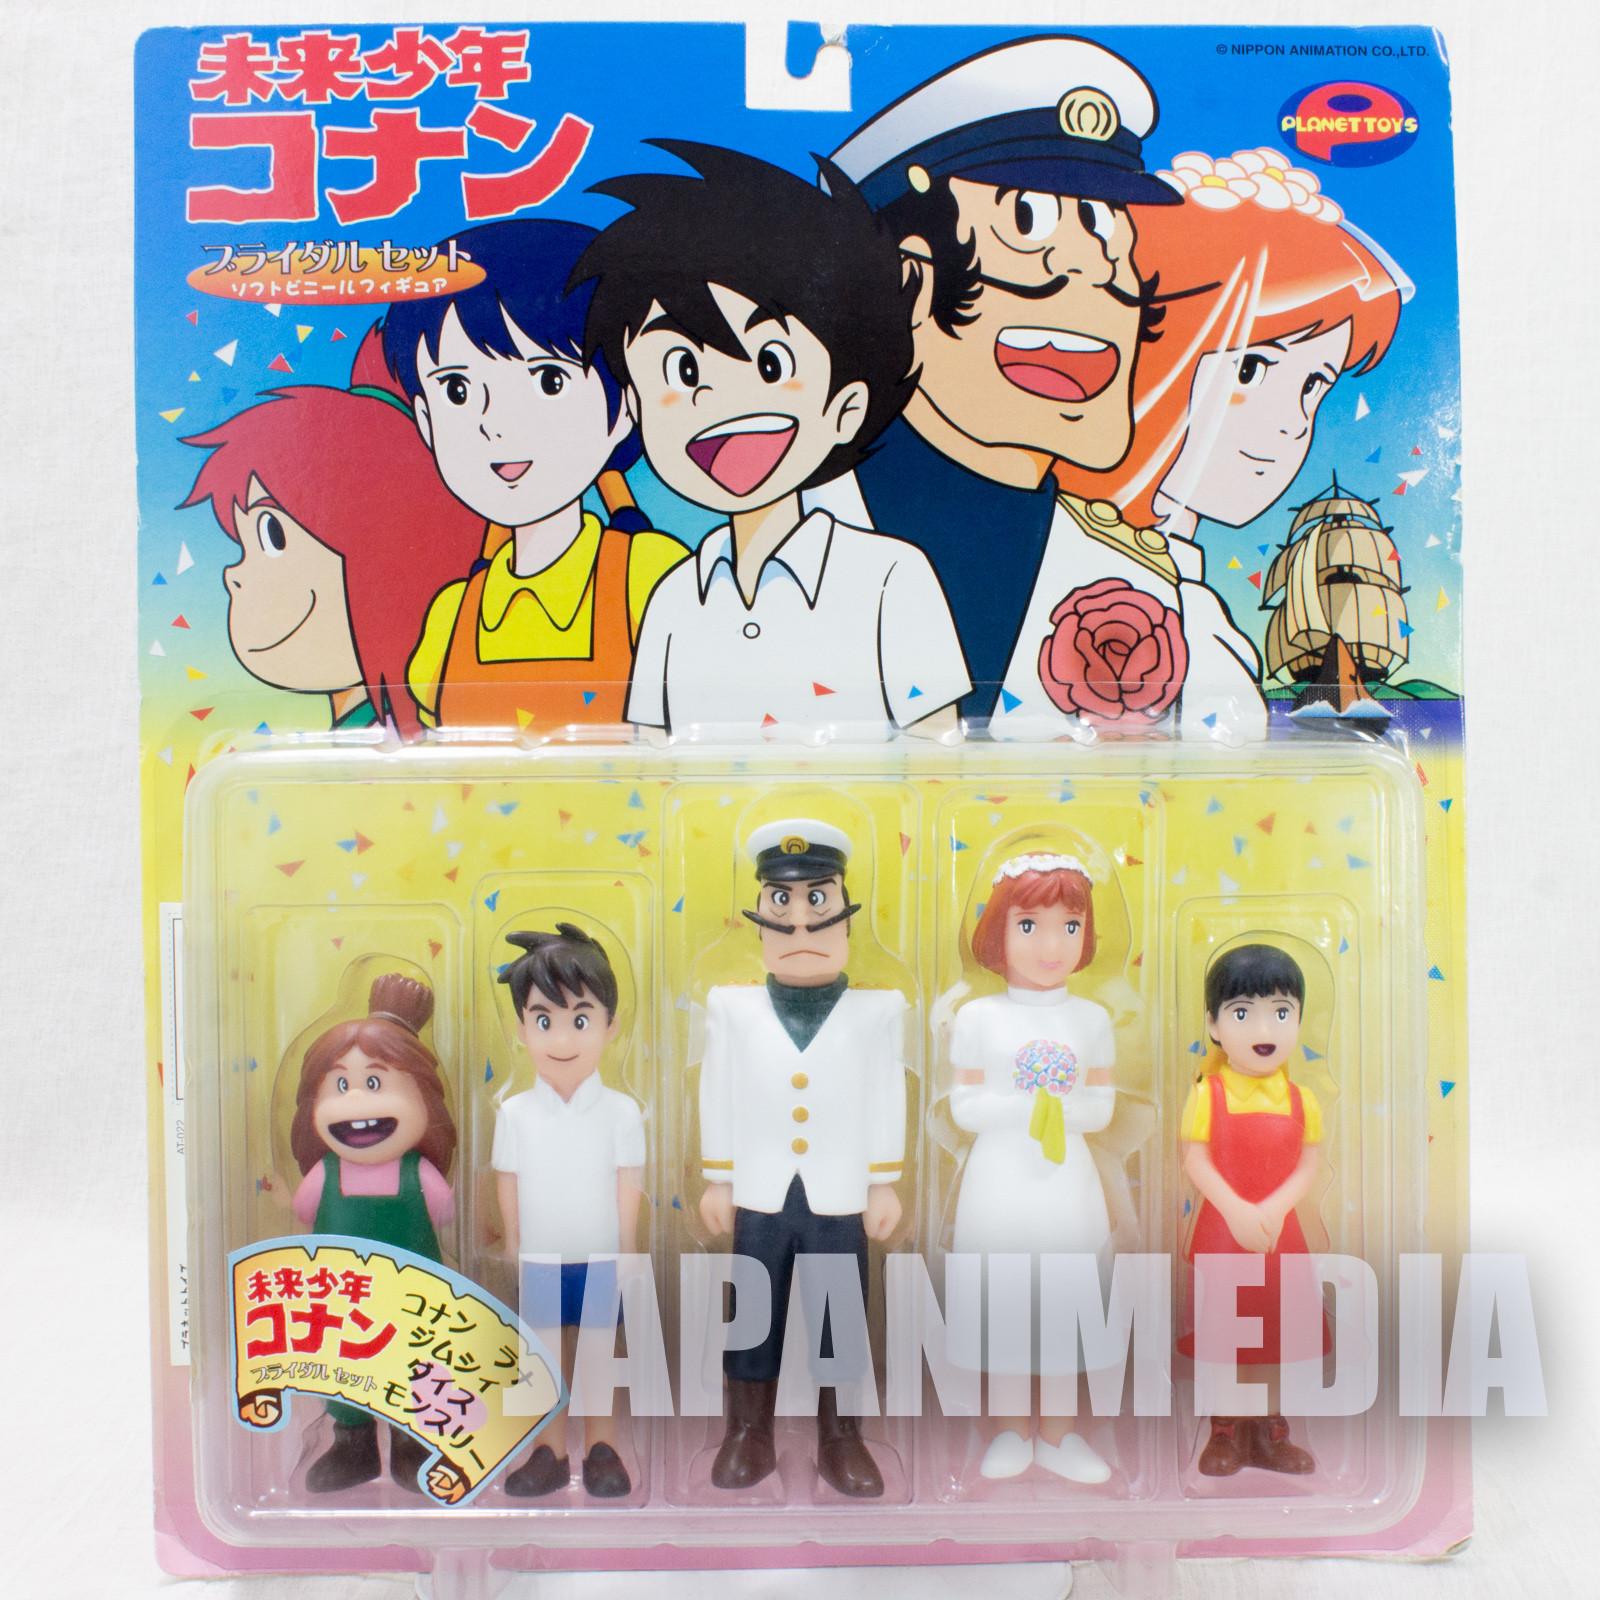 RARE! Future Boy Conan Soft Vinyl Figure 5pc Set [Conan / Lana / Jimsy / Dyce / Monsley] Planet Toy JAPAN ANIME